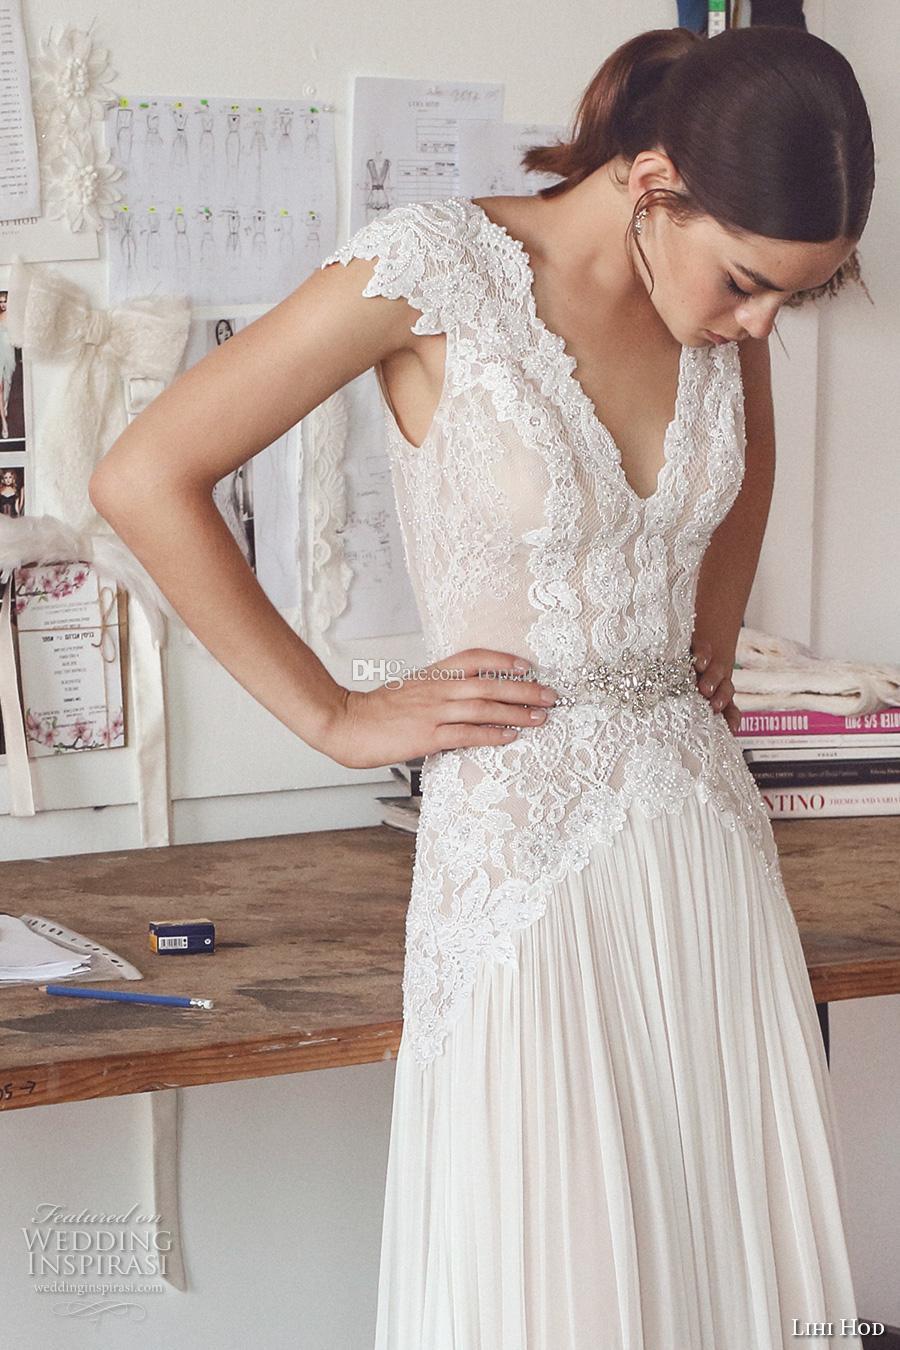 2019 Guaina Avorio Abiti da sposa Chiffon Cap Sleeve Backless Cristalli Perle Vintage Lace Floor Lunghezza Boemia Boho Abiti da sposa